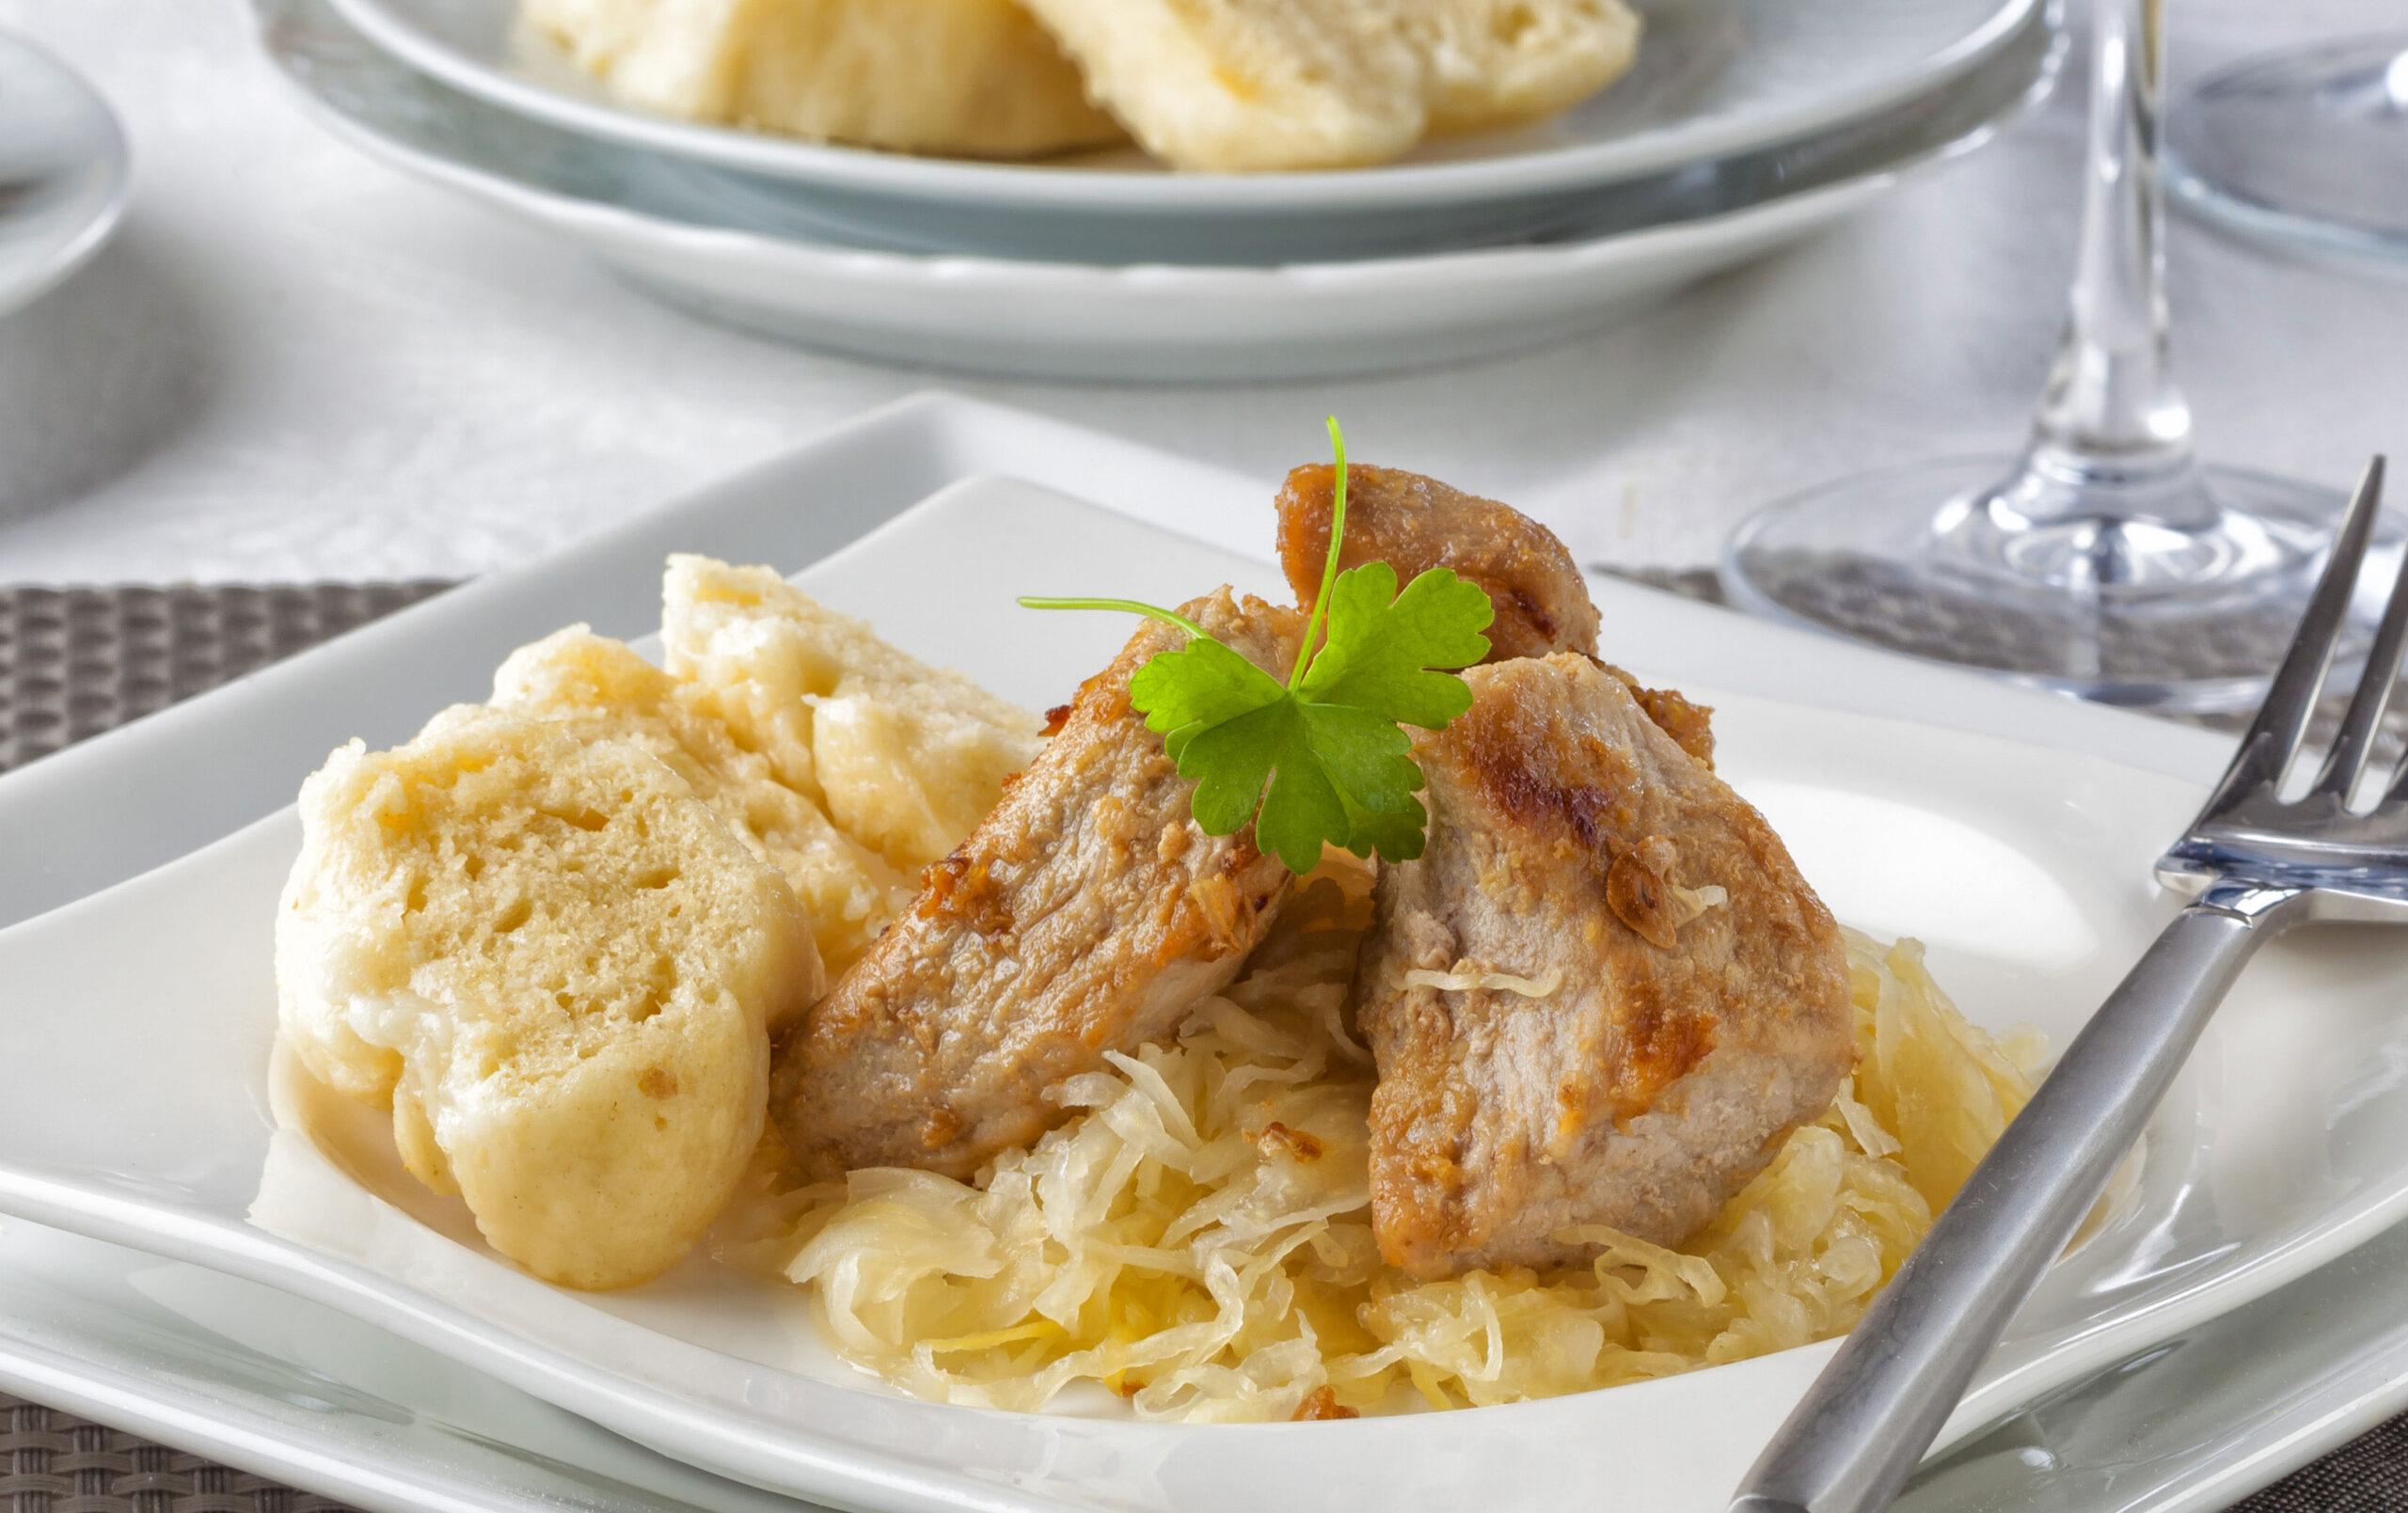 Veprove Knedliky sauerkraut tradisjonsmat Tsjekkia